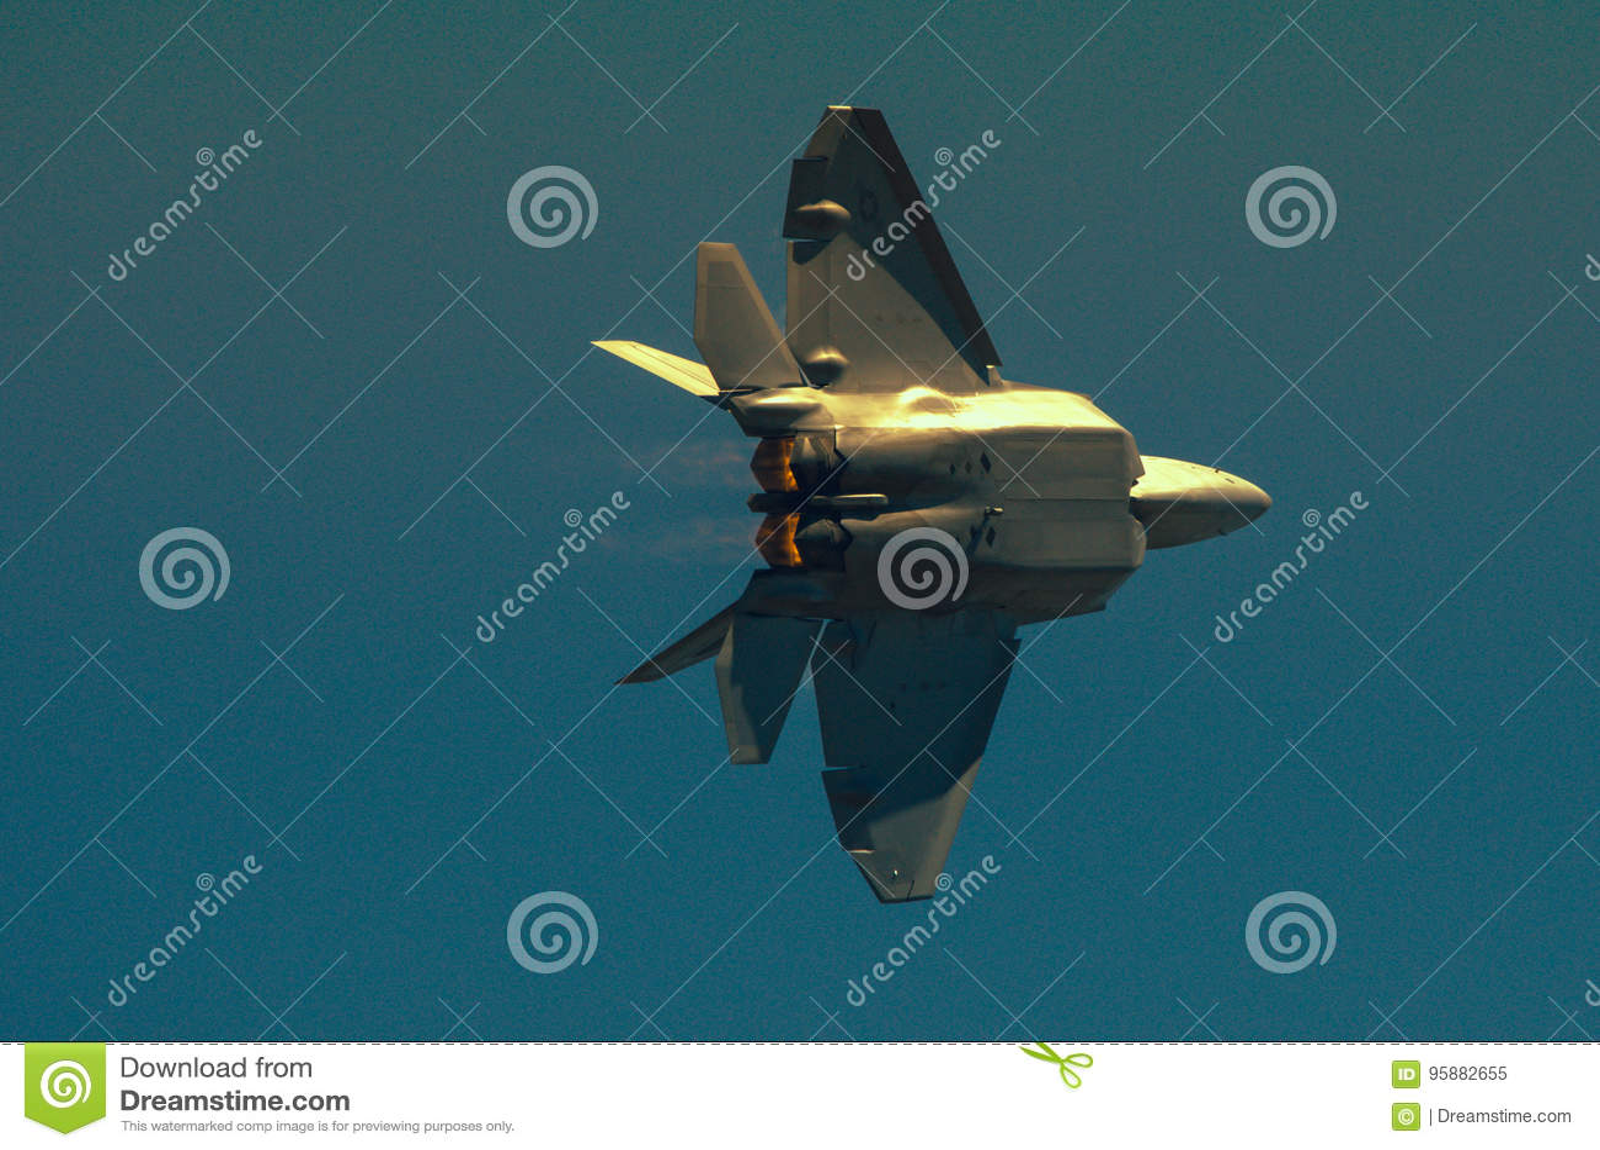 F22 Raptor stock image  Image of inmotion, fighter, captured